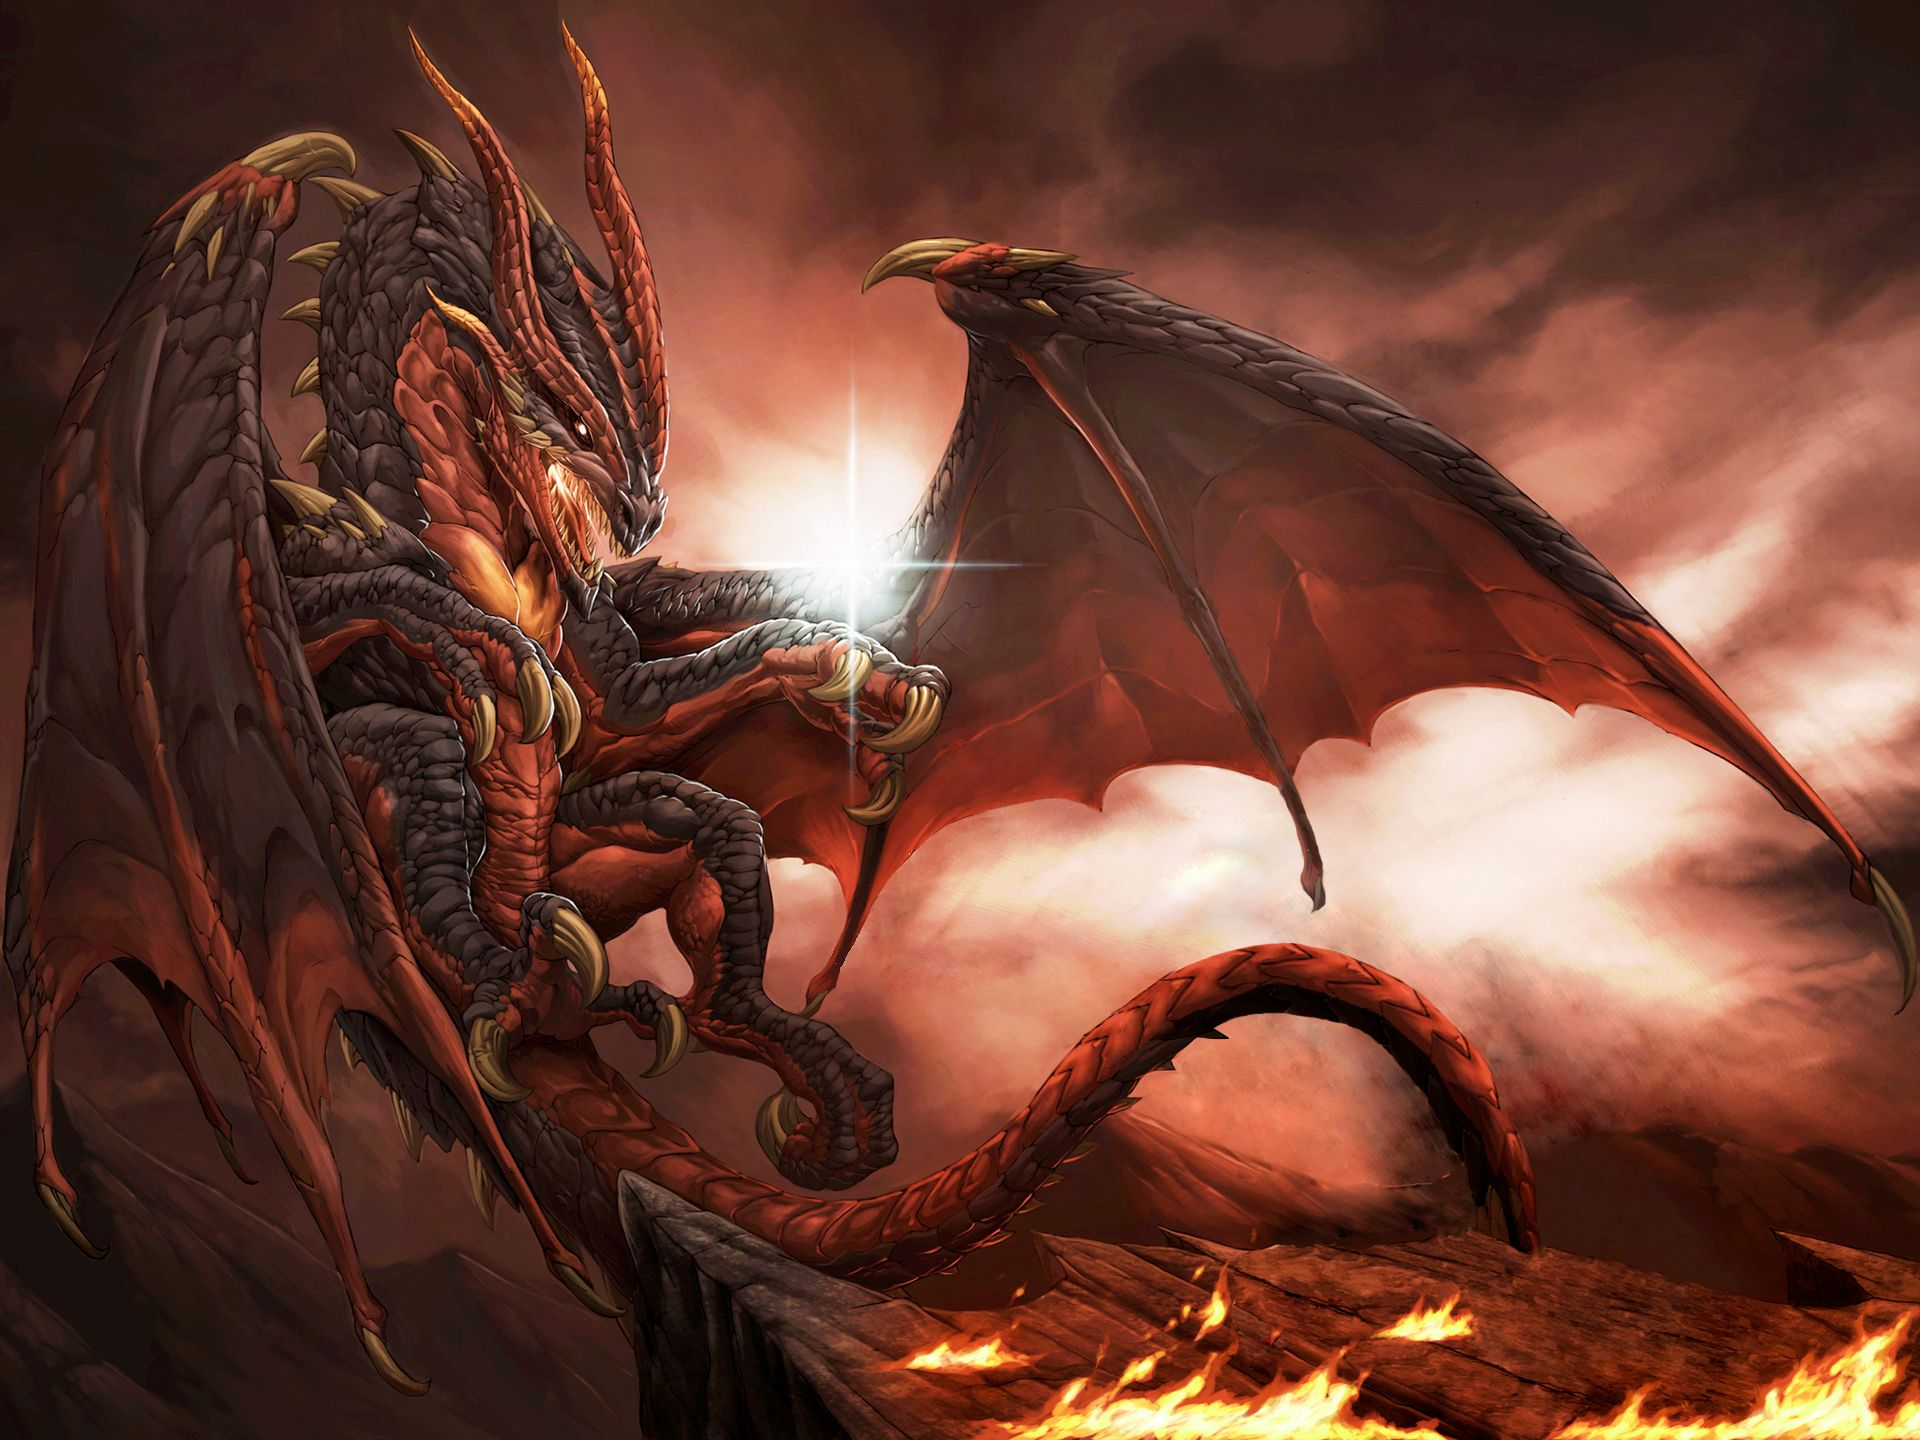 Fire Dragon Wallpaper - Unicorn Fighting A Dragon - HD Wallpaper